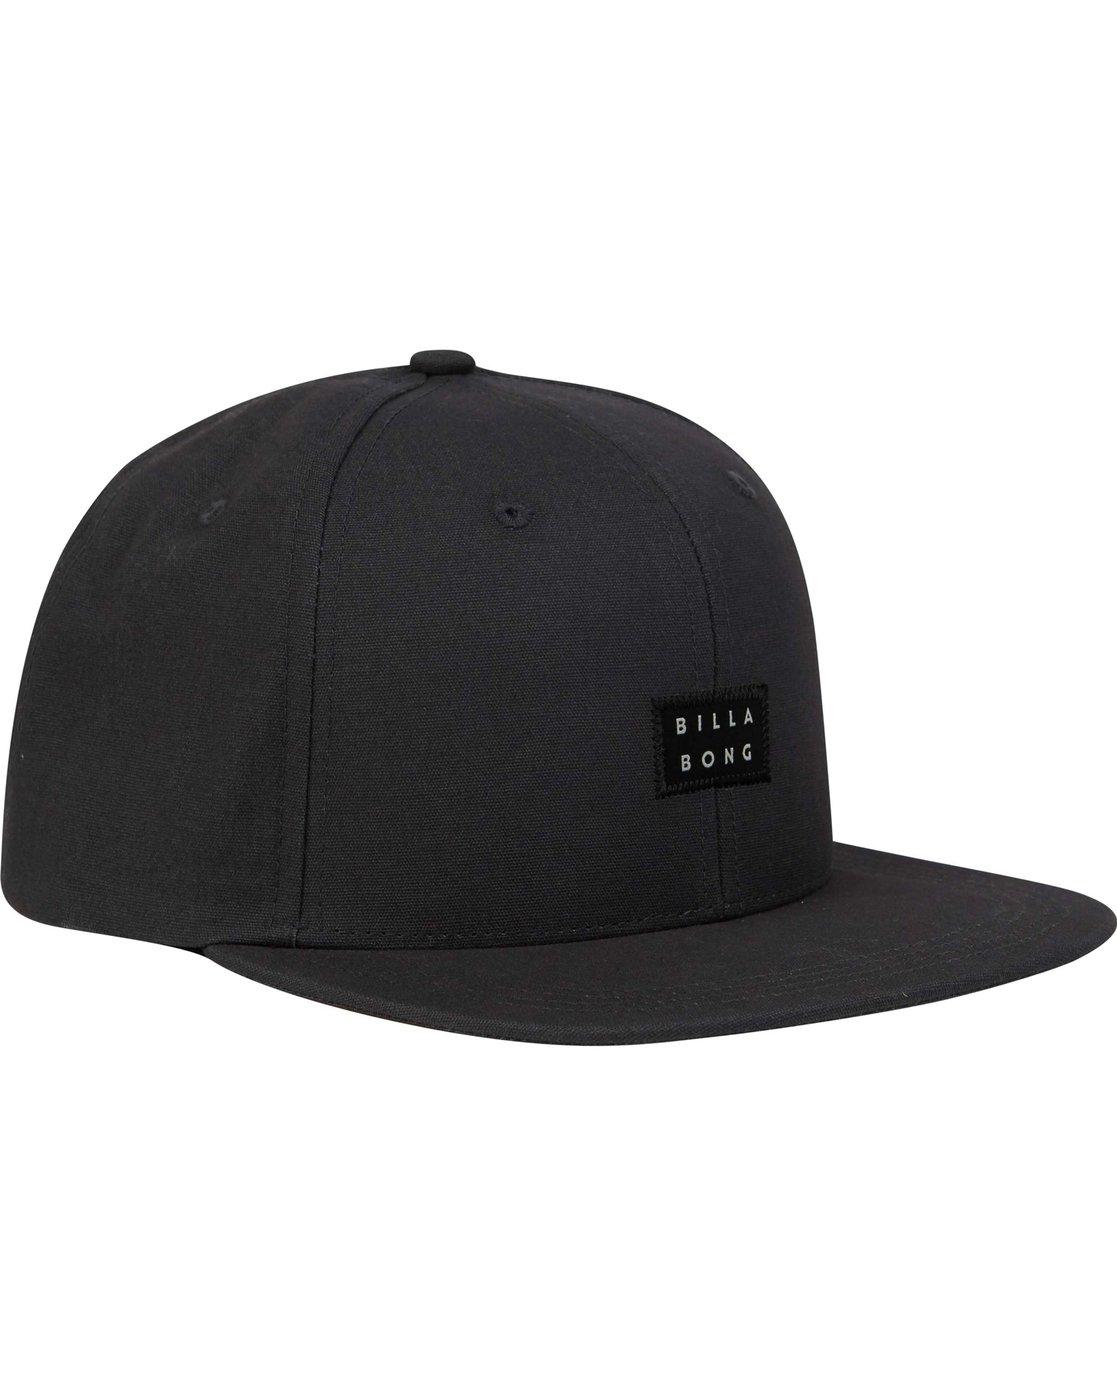 ea391ffdb8422 ... get 2 primary snapback hat black mahwpbpr billabong 63b81 d7857